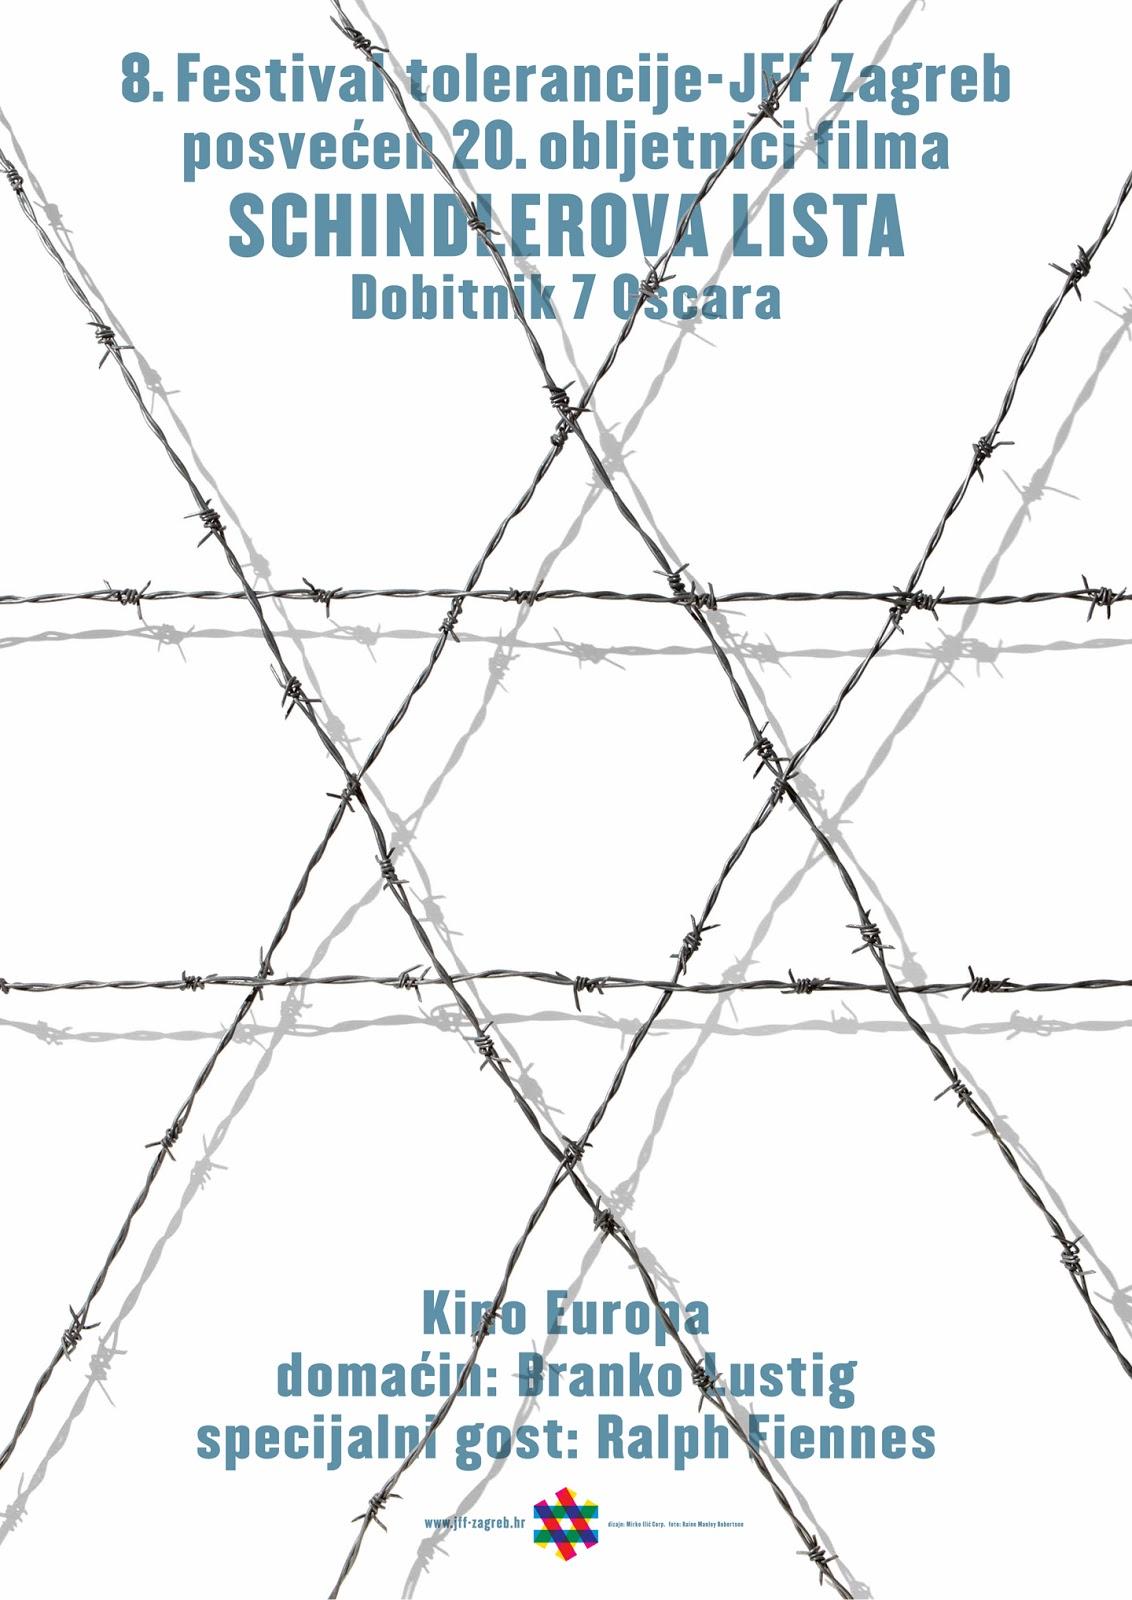 Schindler poster 2.1